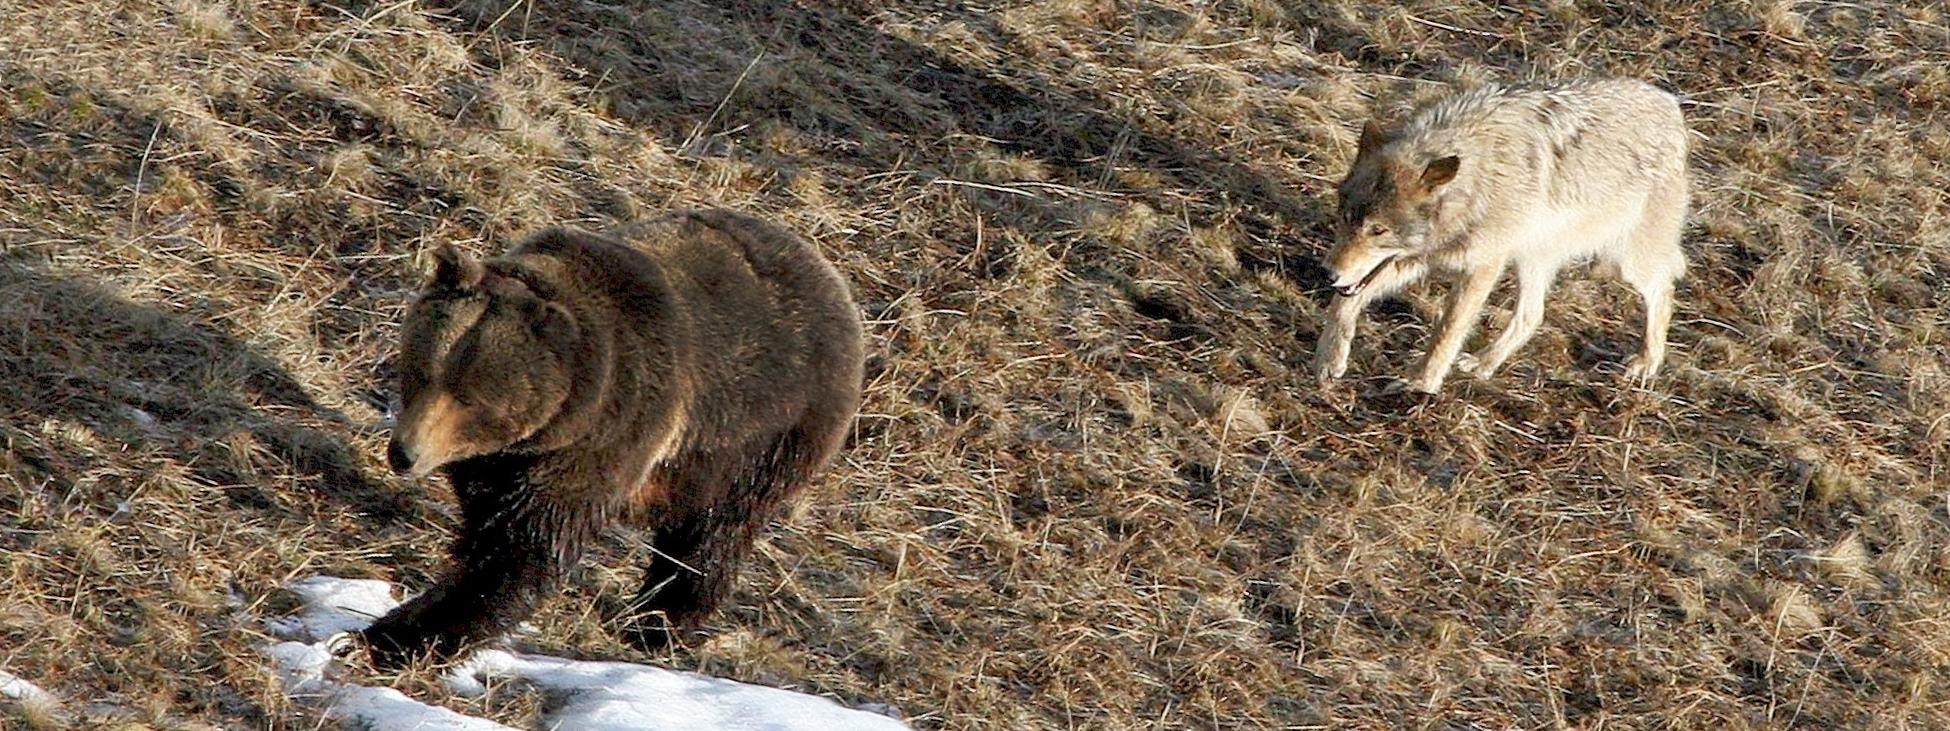 WS Yellowstone wolf and bear-519226.jpg